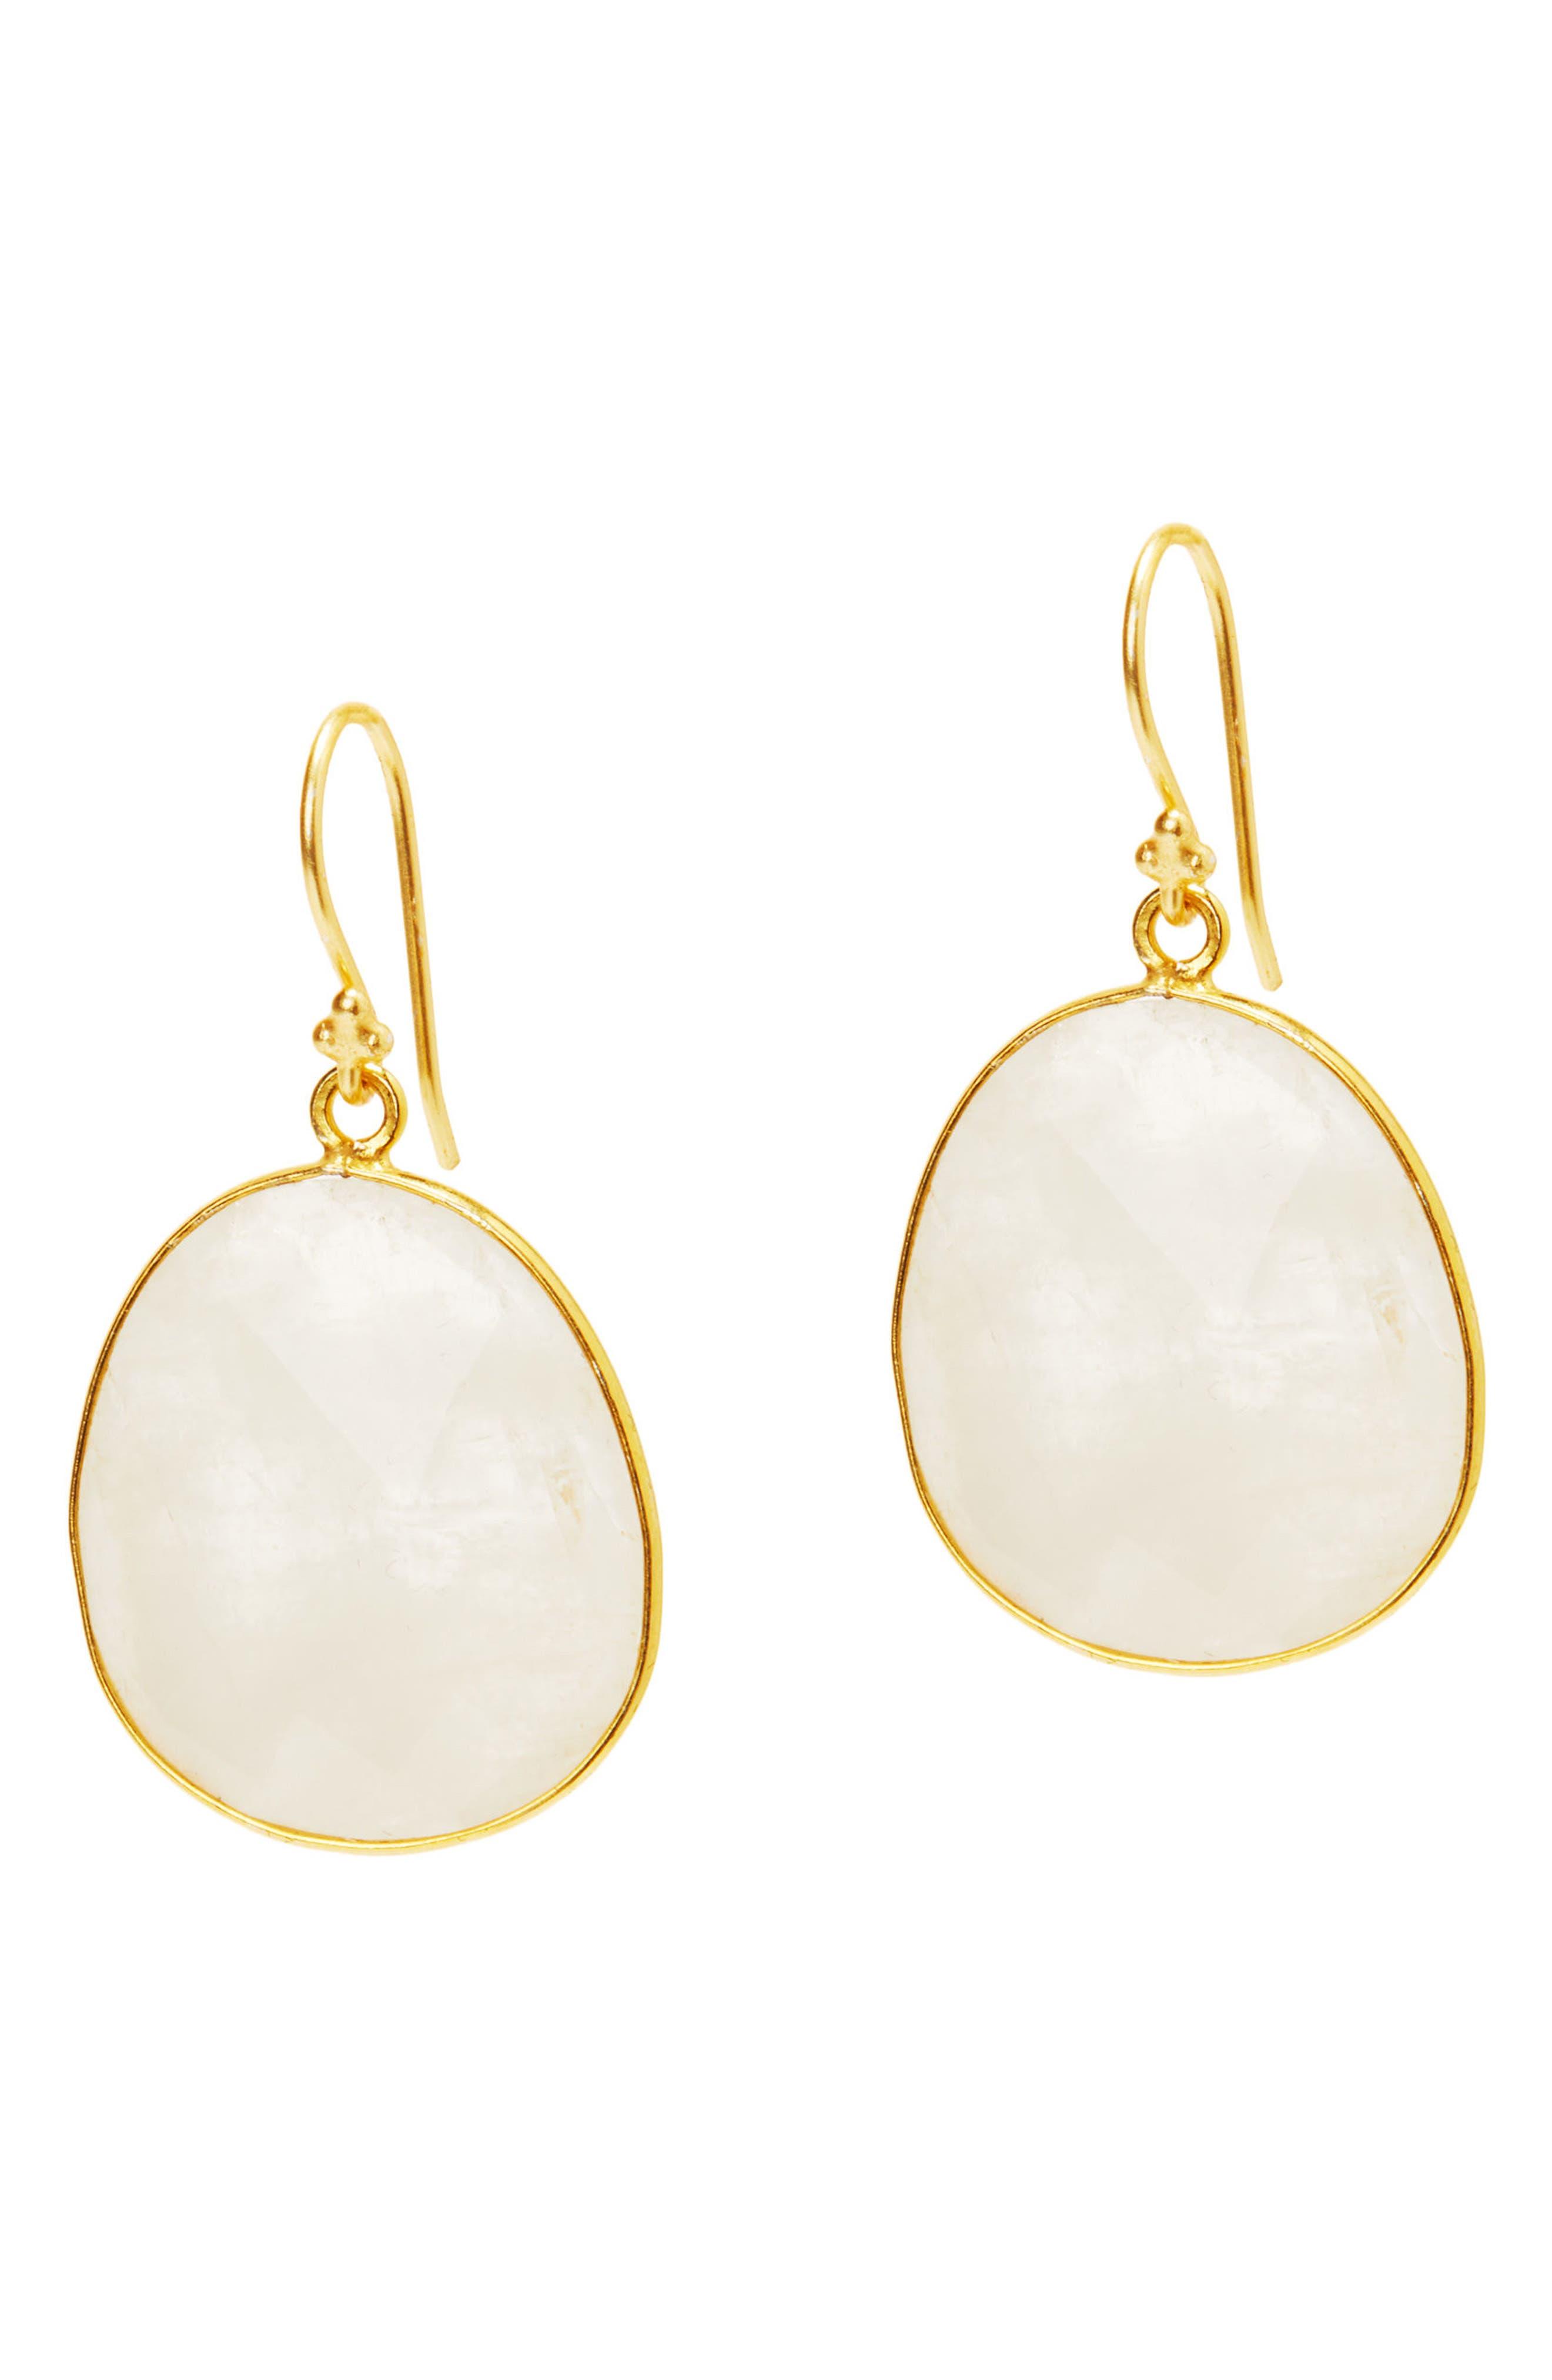 Mustique Semiprecious Stone Drop Earrings,                             Main thumbnail 1, color,                             MOONSTONE